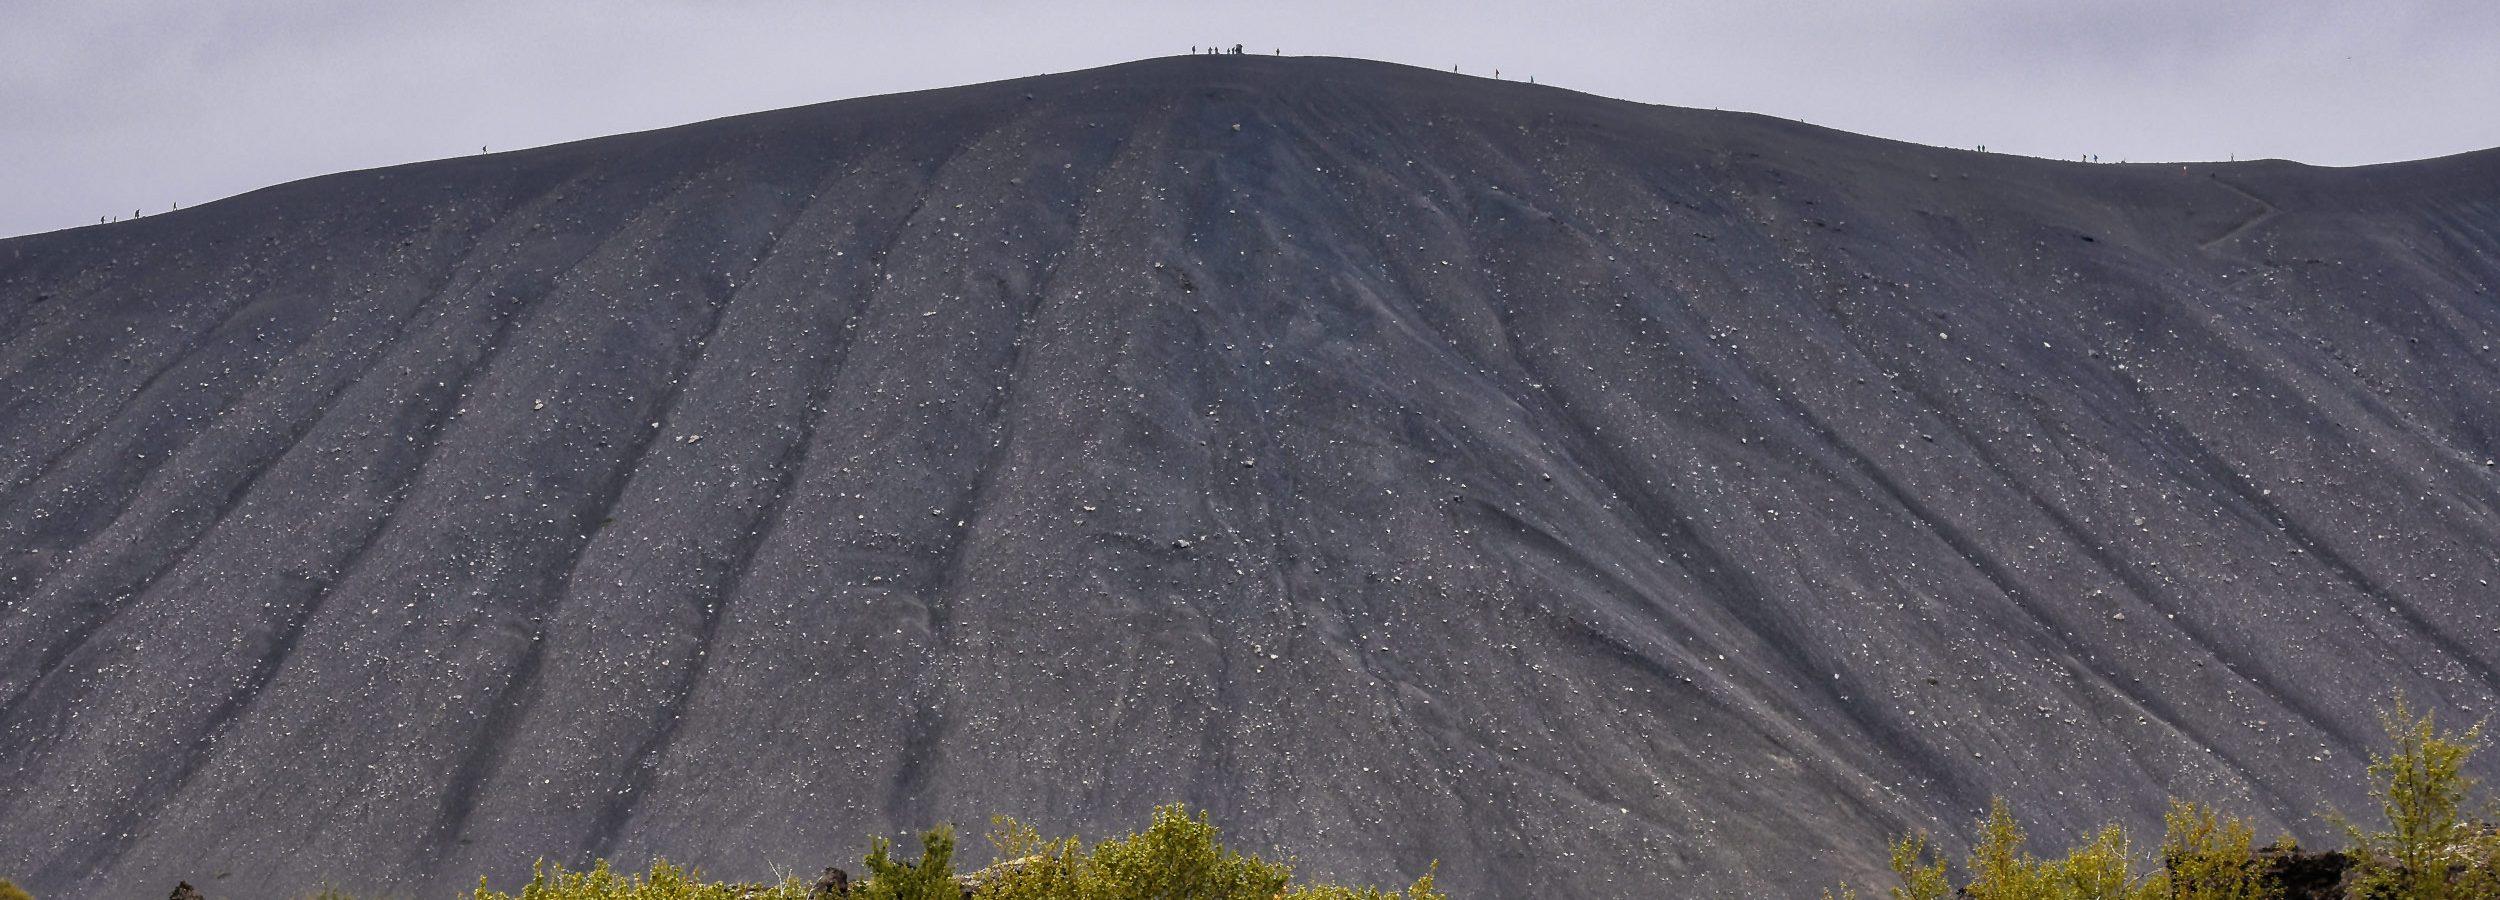 Wygasły wulkan Hverfjall, Islandia